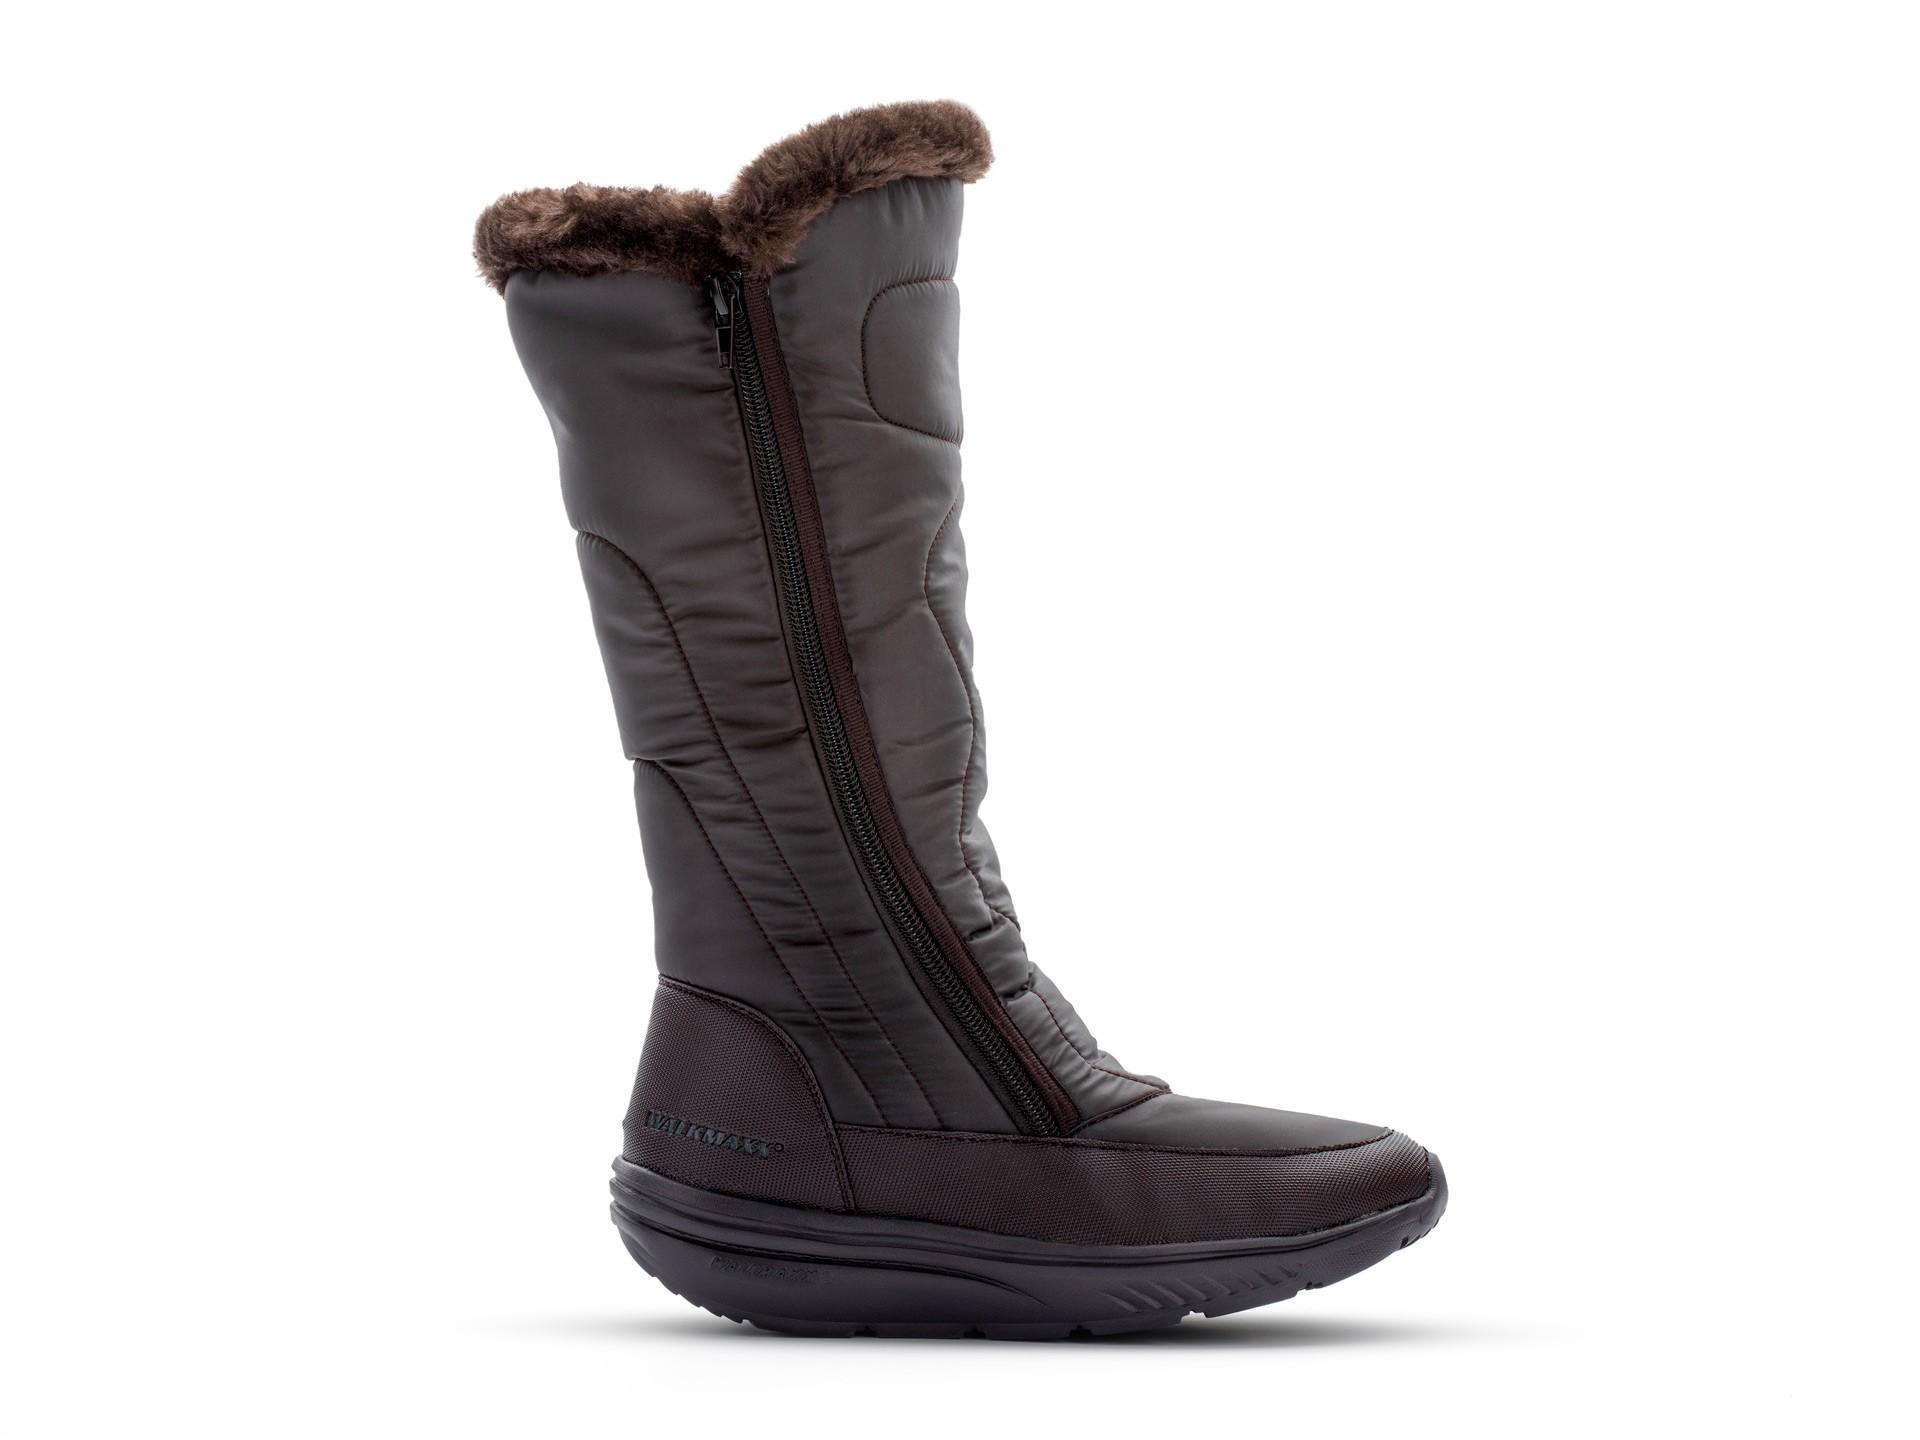 Comfort Winter Boots Women High 2.0 c63fbe2f48c5d